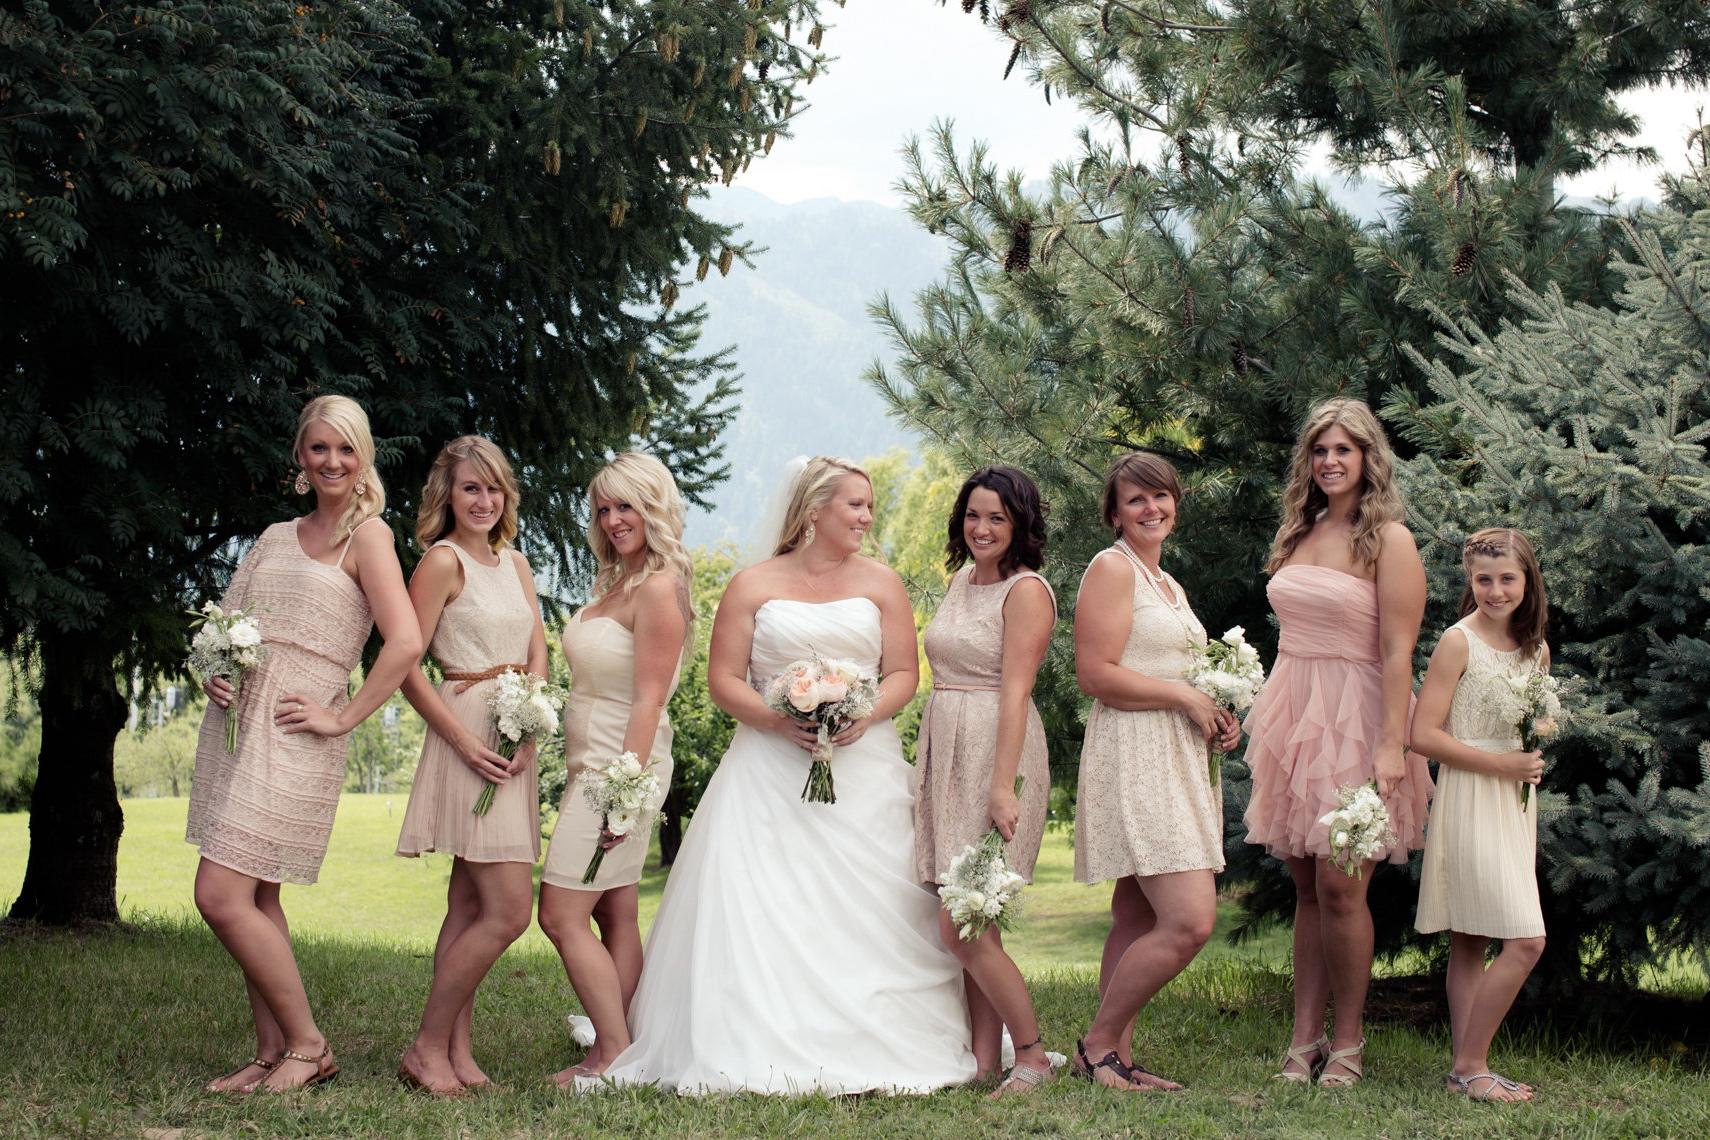 Heather wedding edits-0379_2.jpg